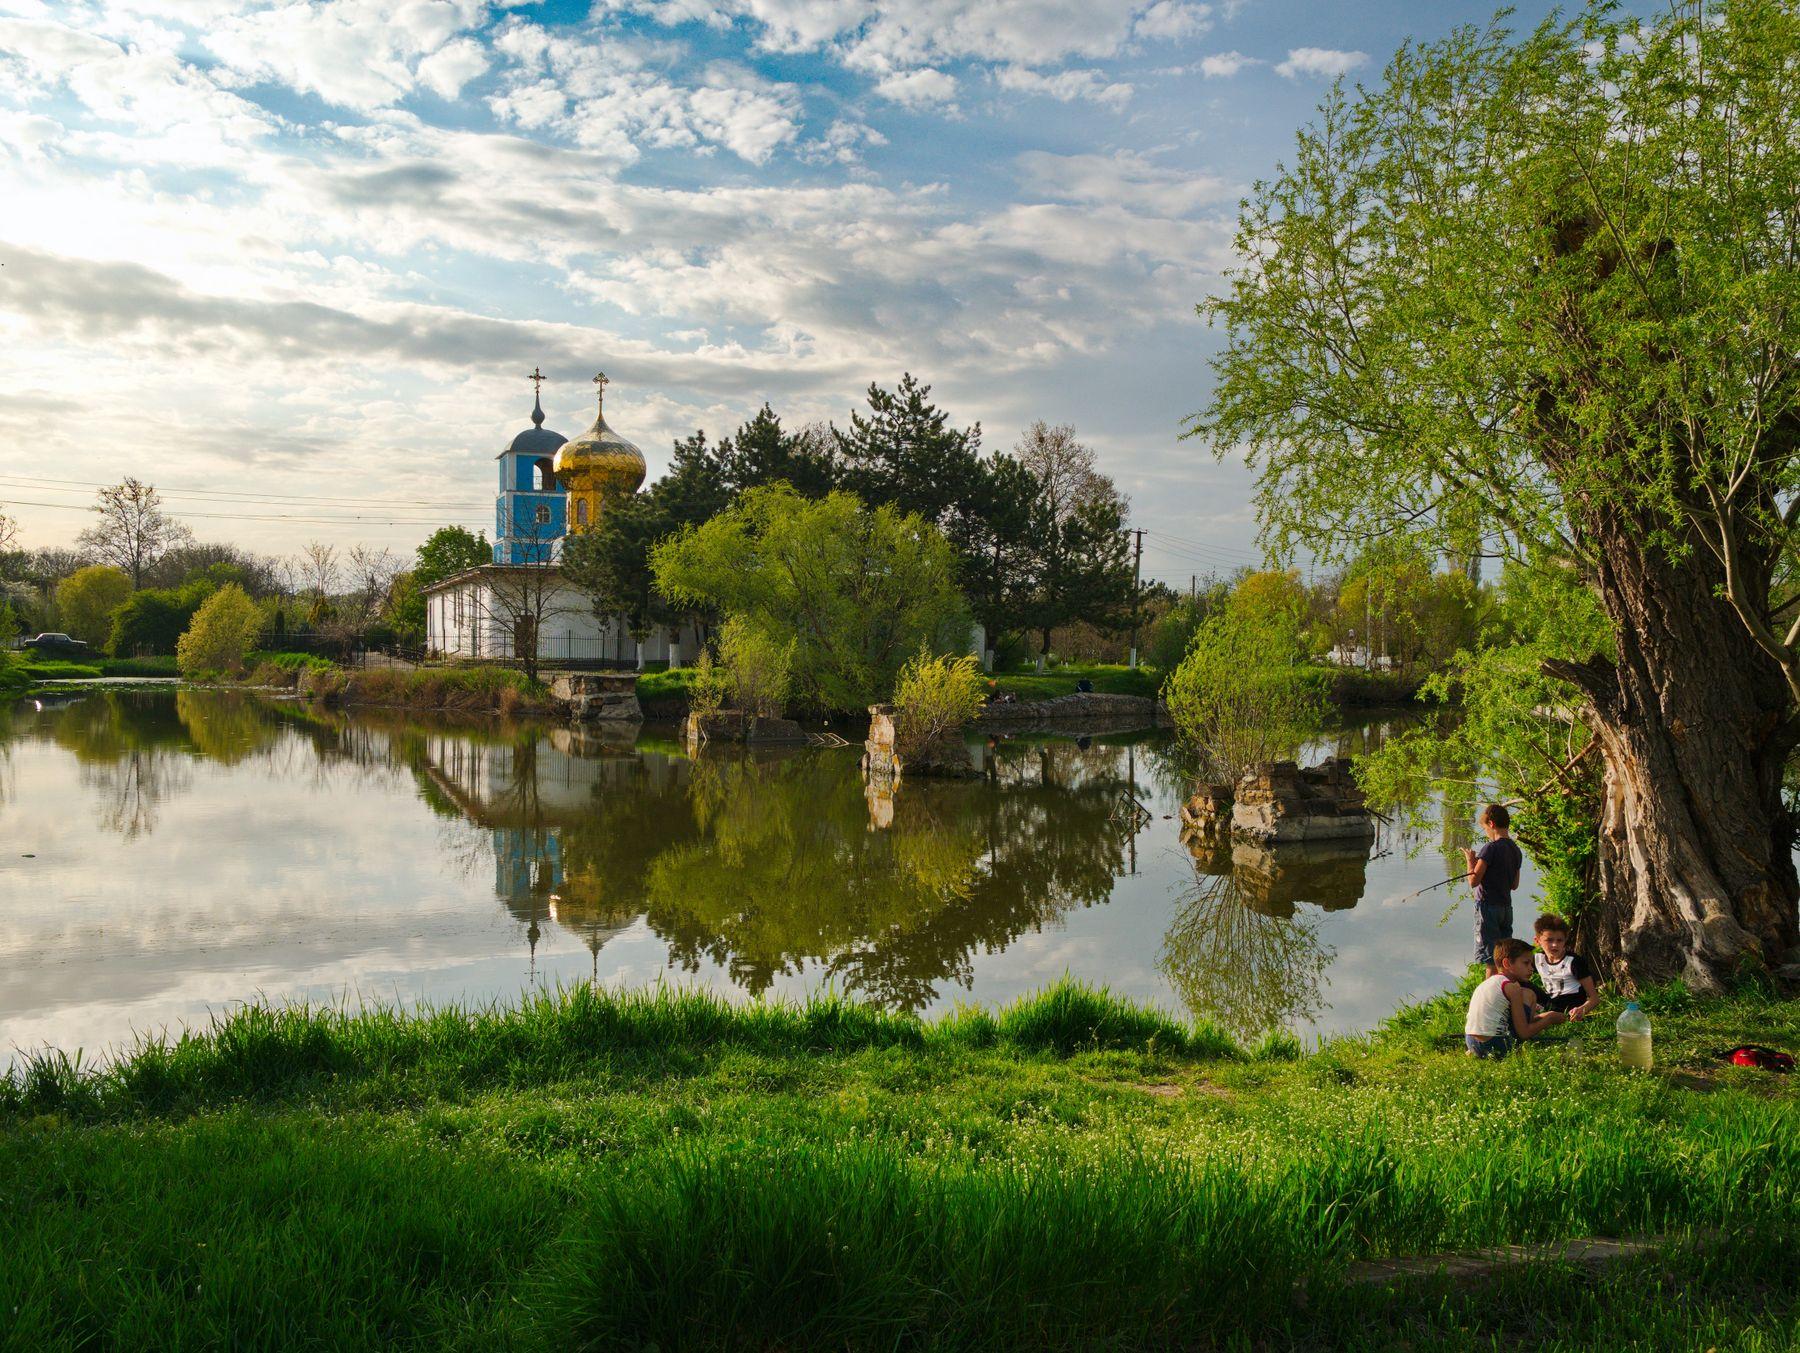 Вечер на берегу пруда Крым природа озеро пруд церковь